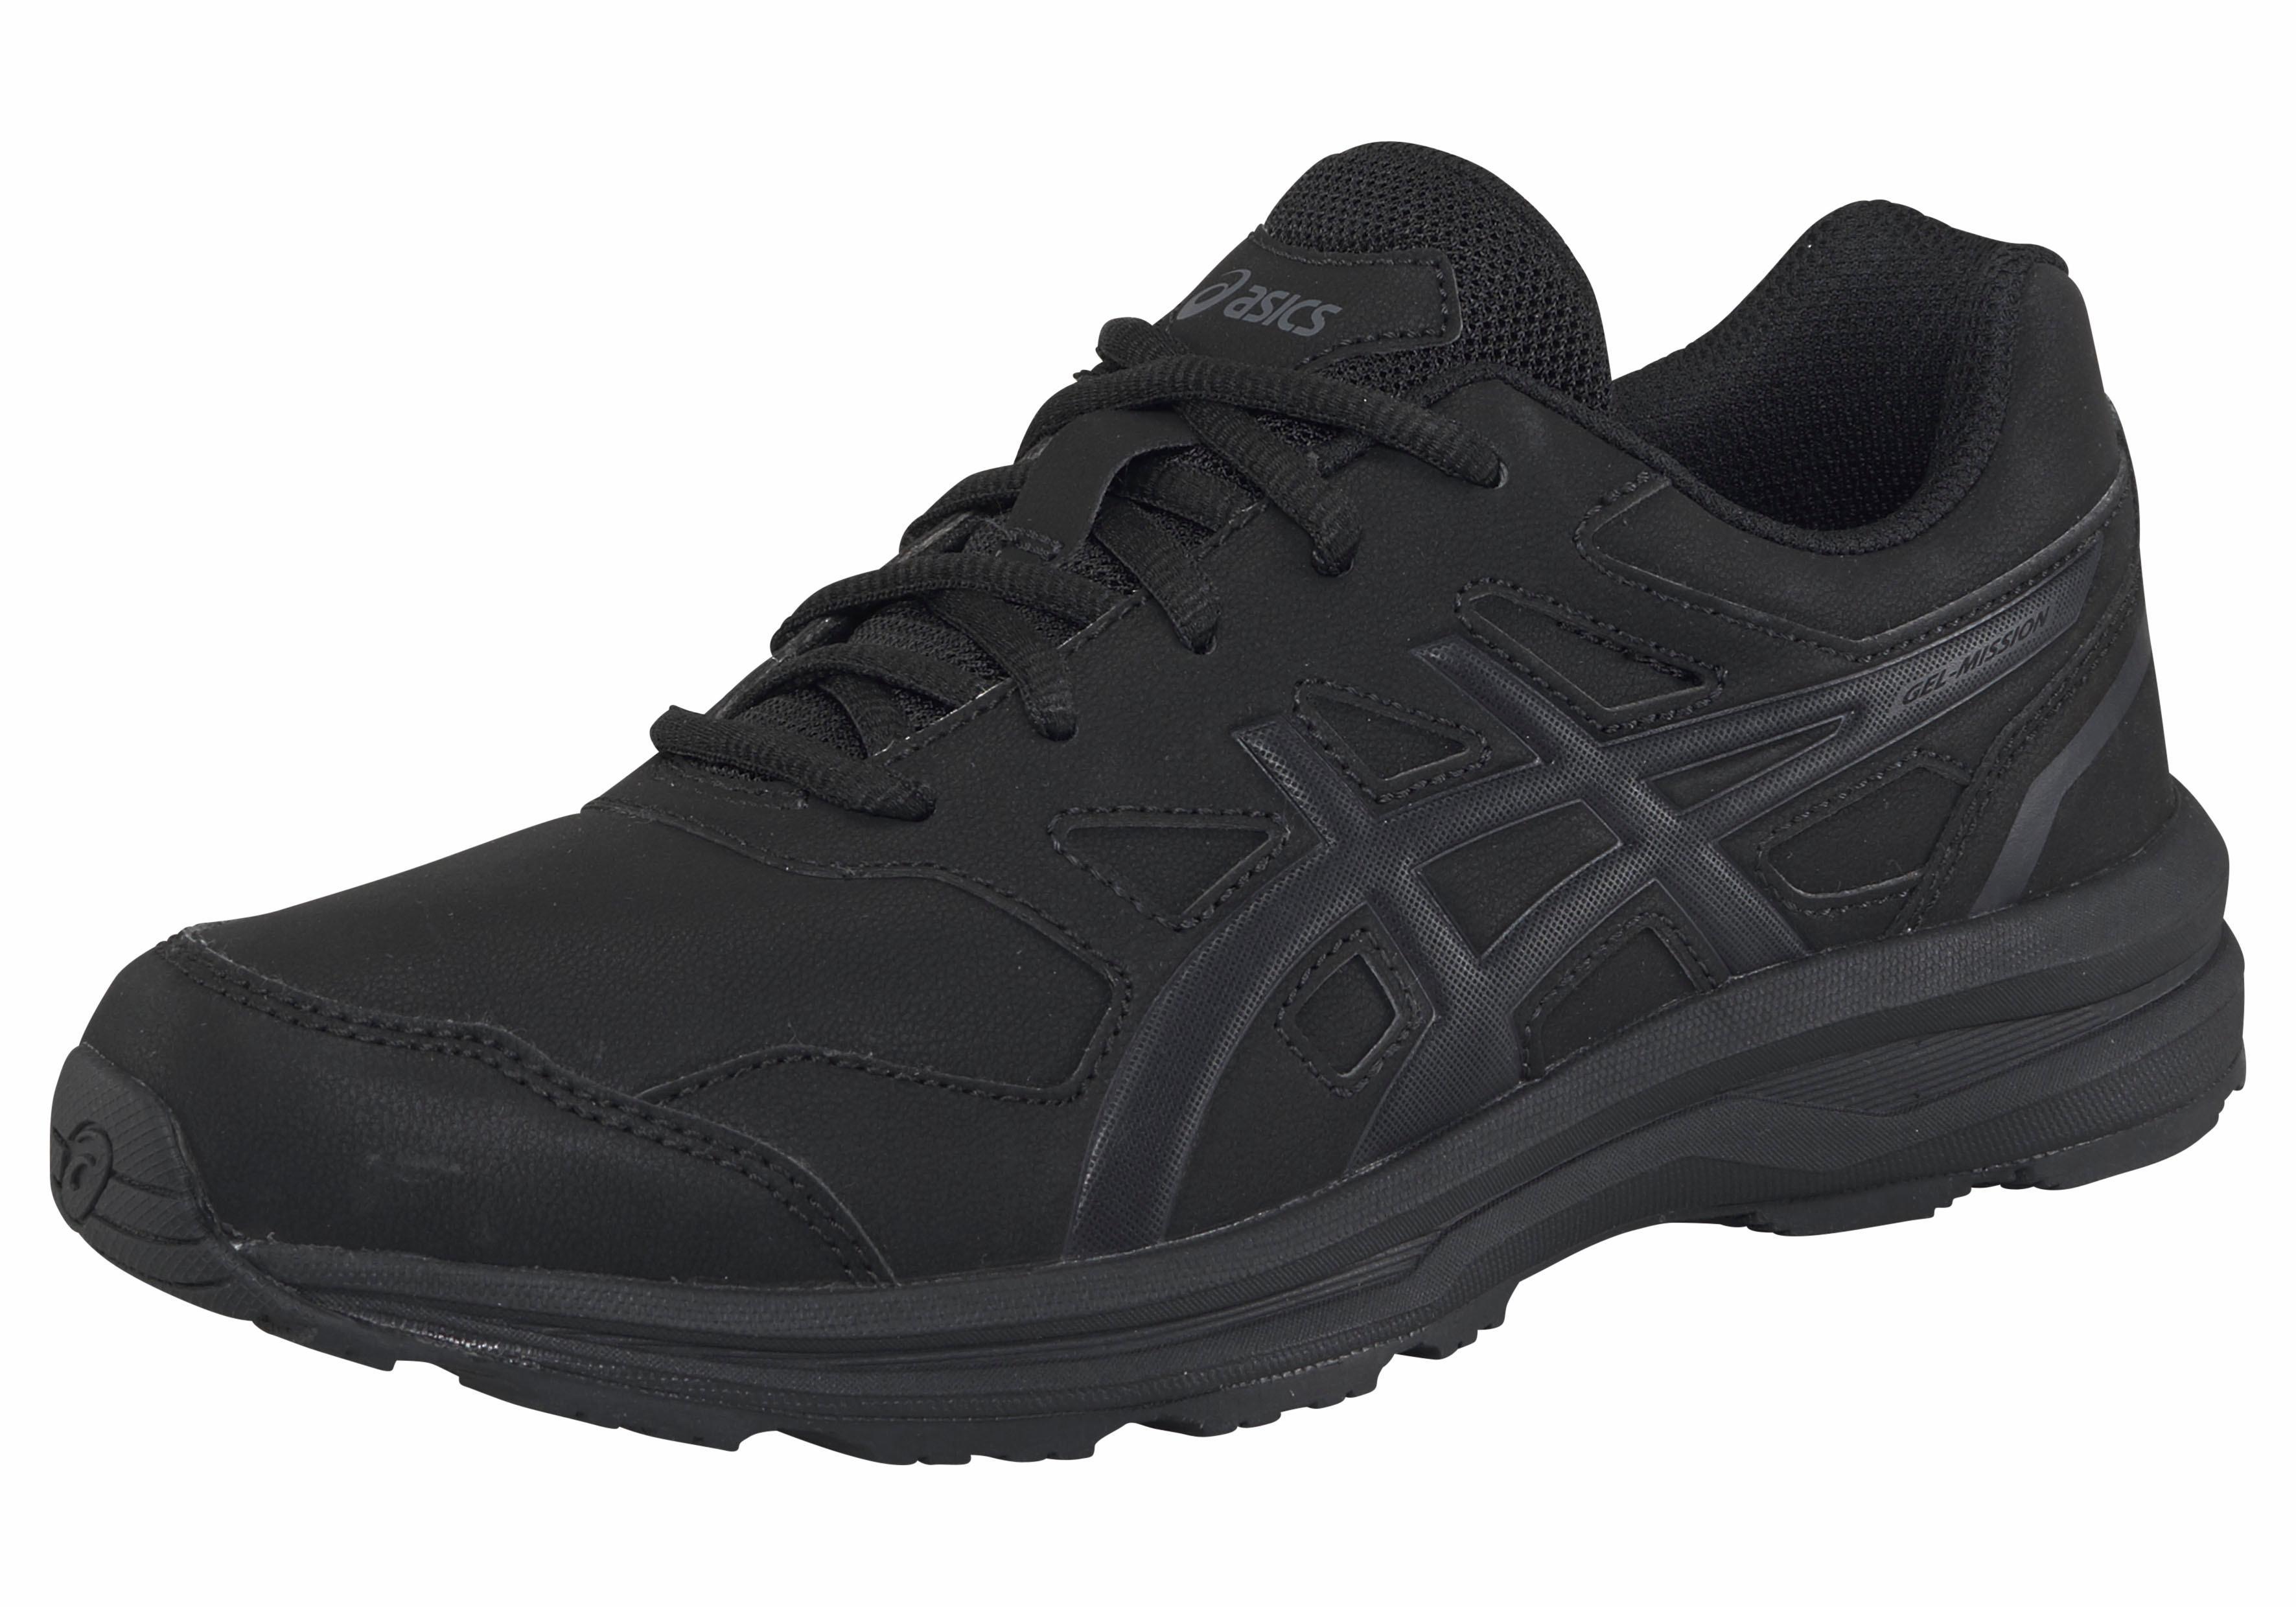 Asics Walkingschuh Gel-Mission 3 W | Schuhe > Sportschuhe > Walkingschuhe | ASICS